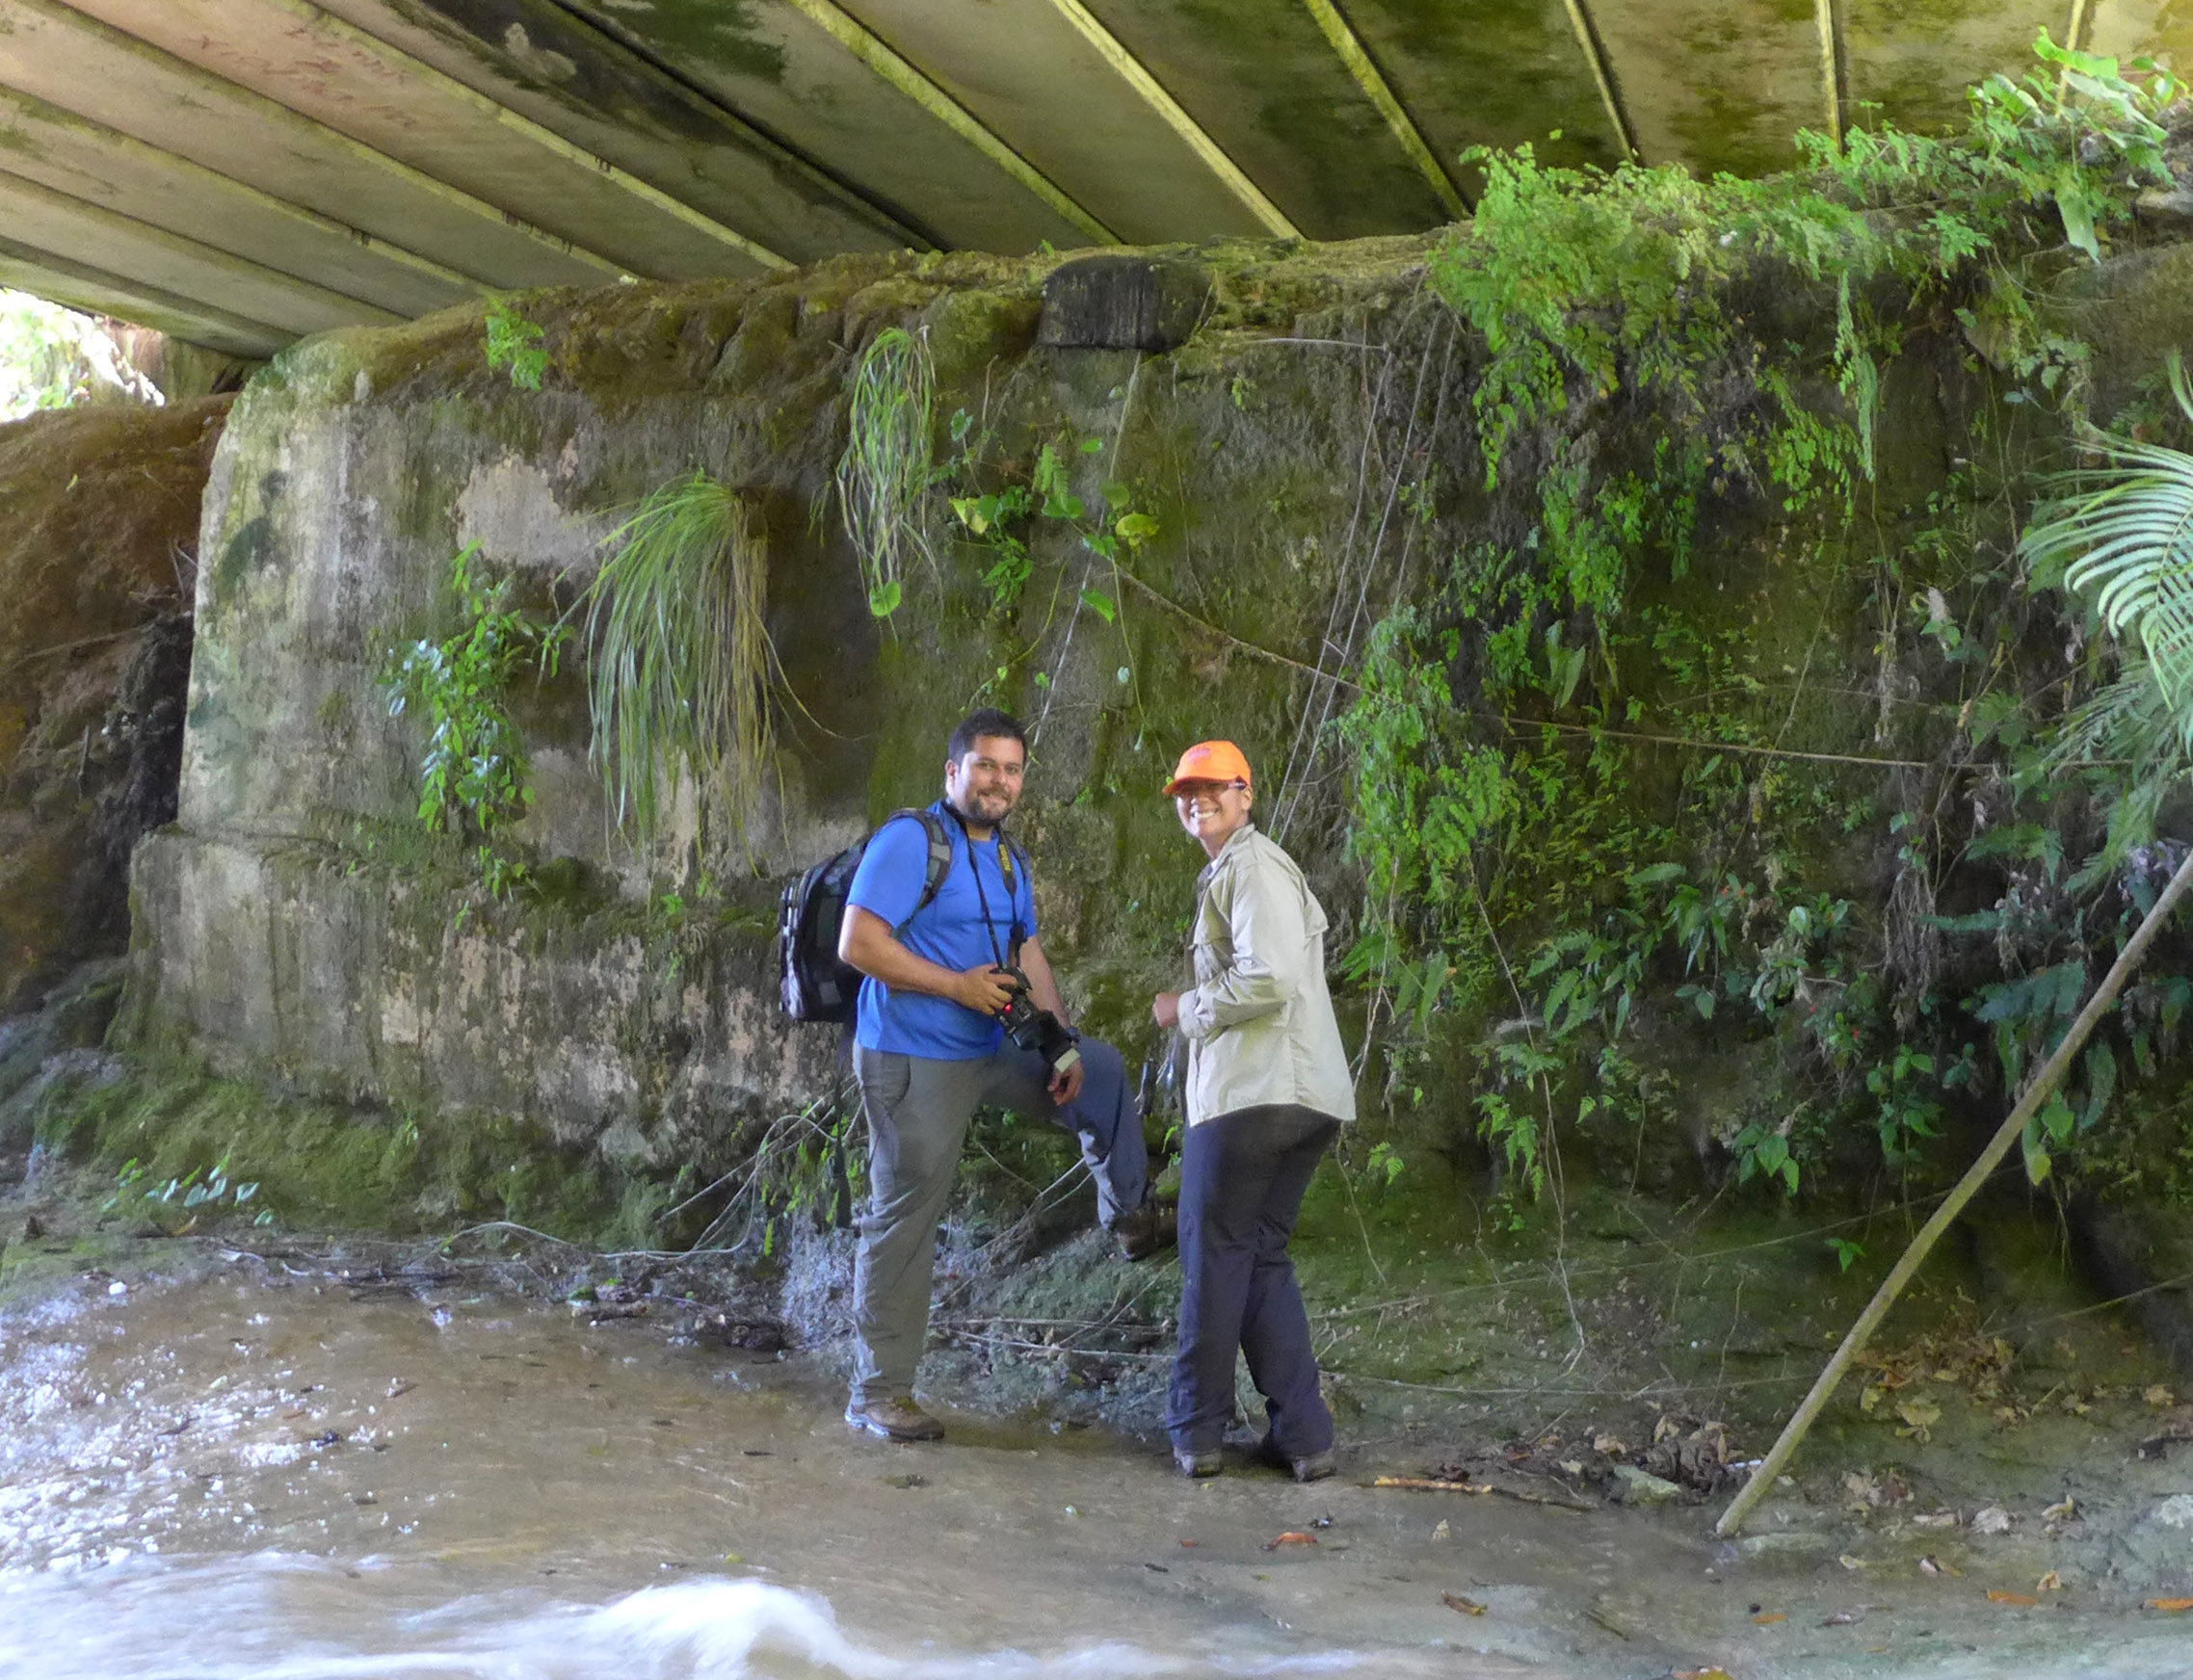 Omar Monsegur-Rivera and Barbara Sanchez look for Thelypteris verecunda beneath a bridge.